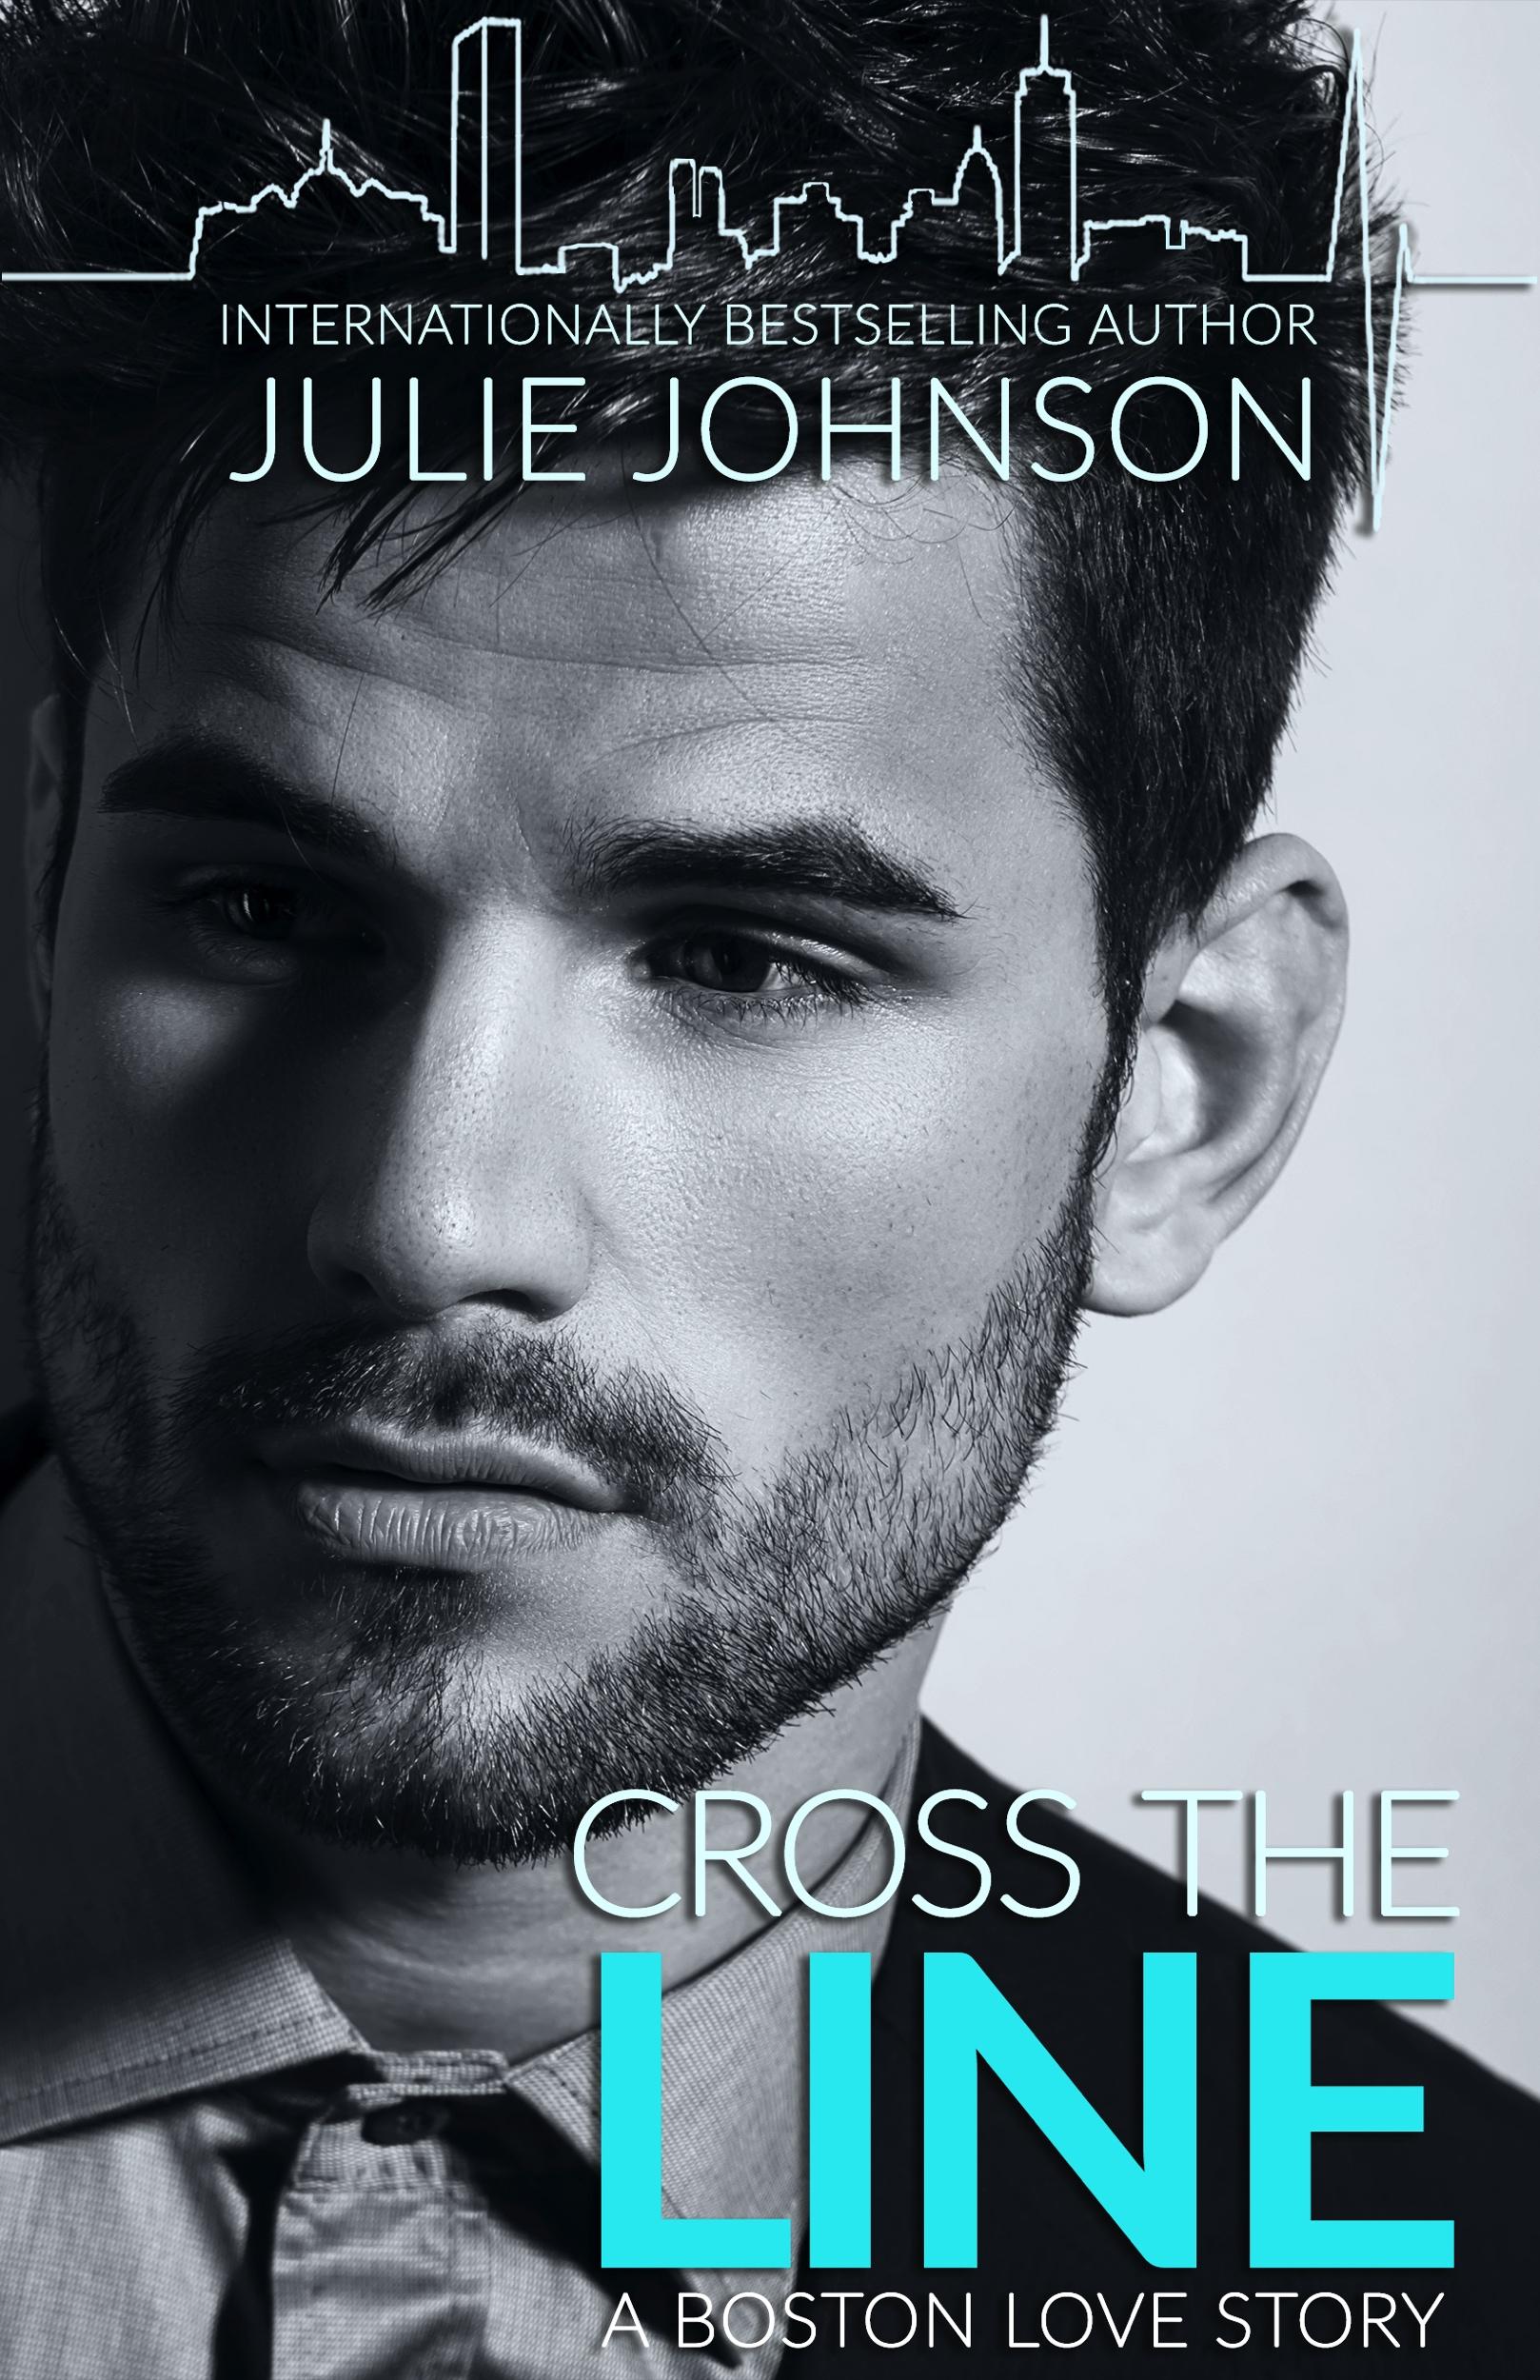 Cross-the-Line-Kindle.jpg